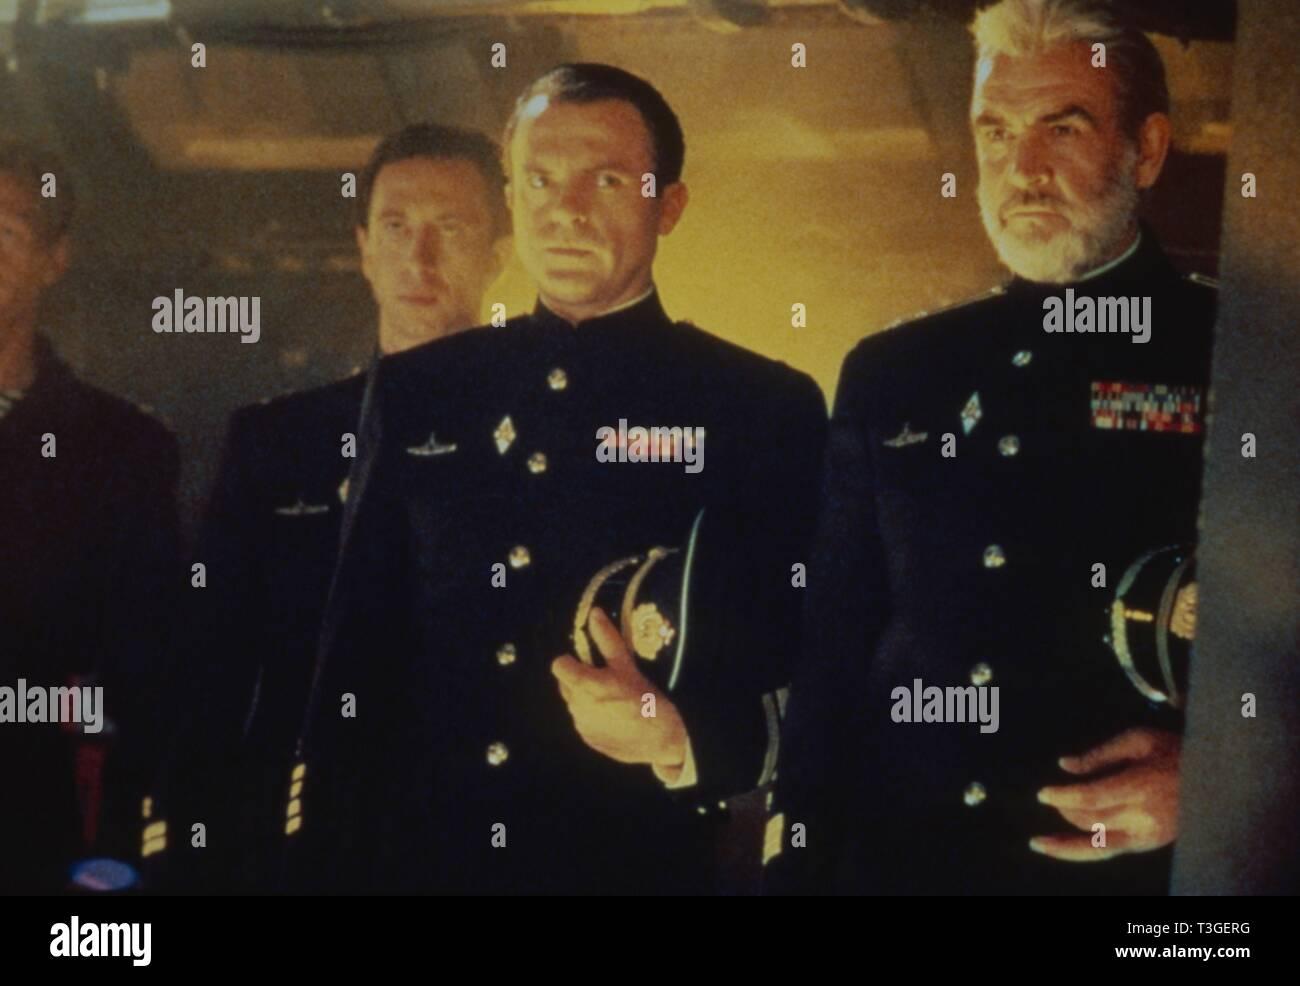 La caza de Octubre Rojo Año : 1990 EE UU Director : John McTiernan Scott Glenn, Sam Neill, Sean Connery Imagen De Stock